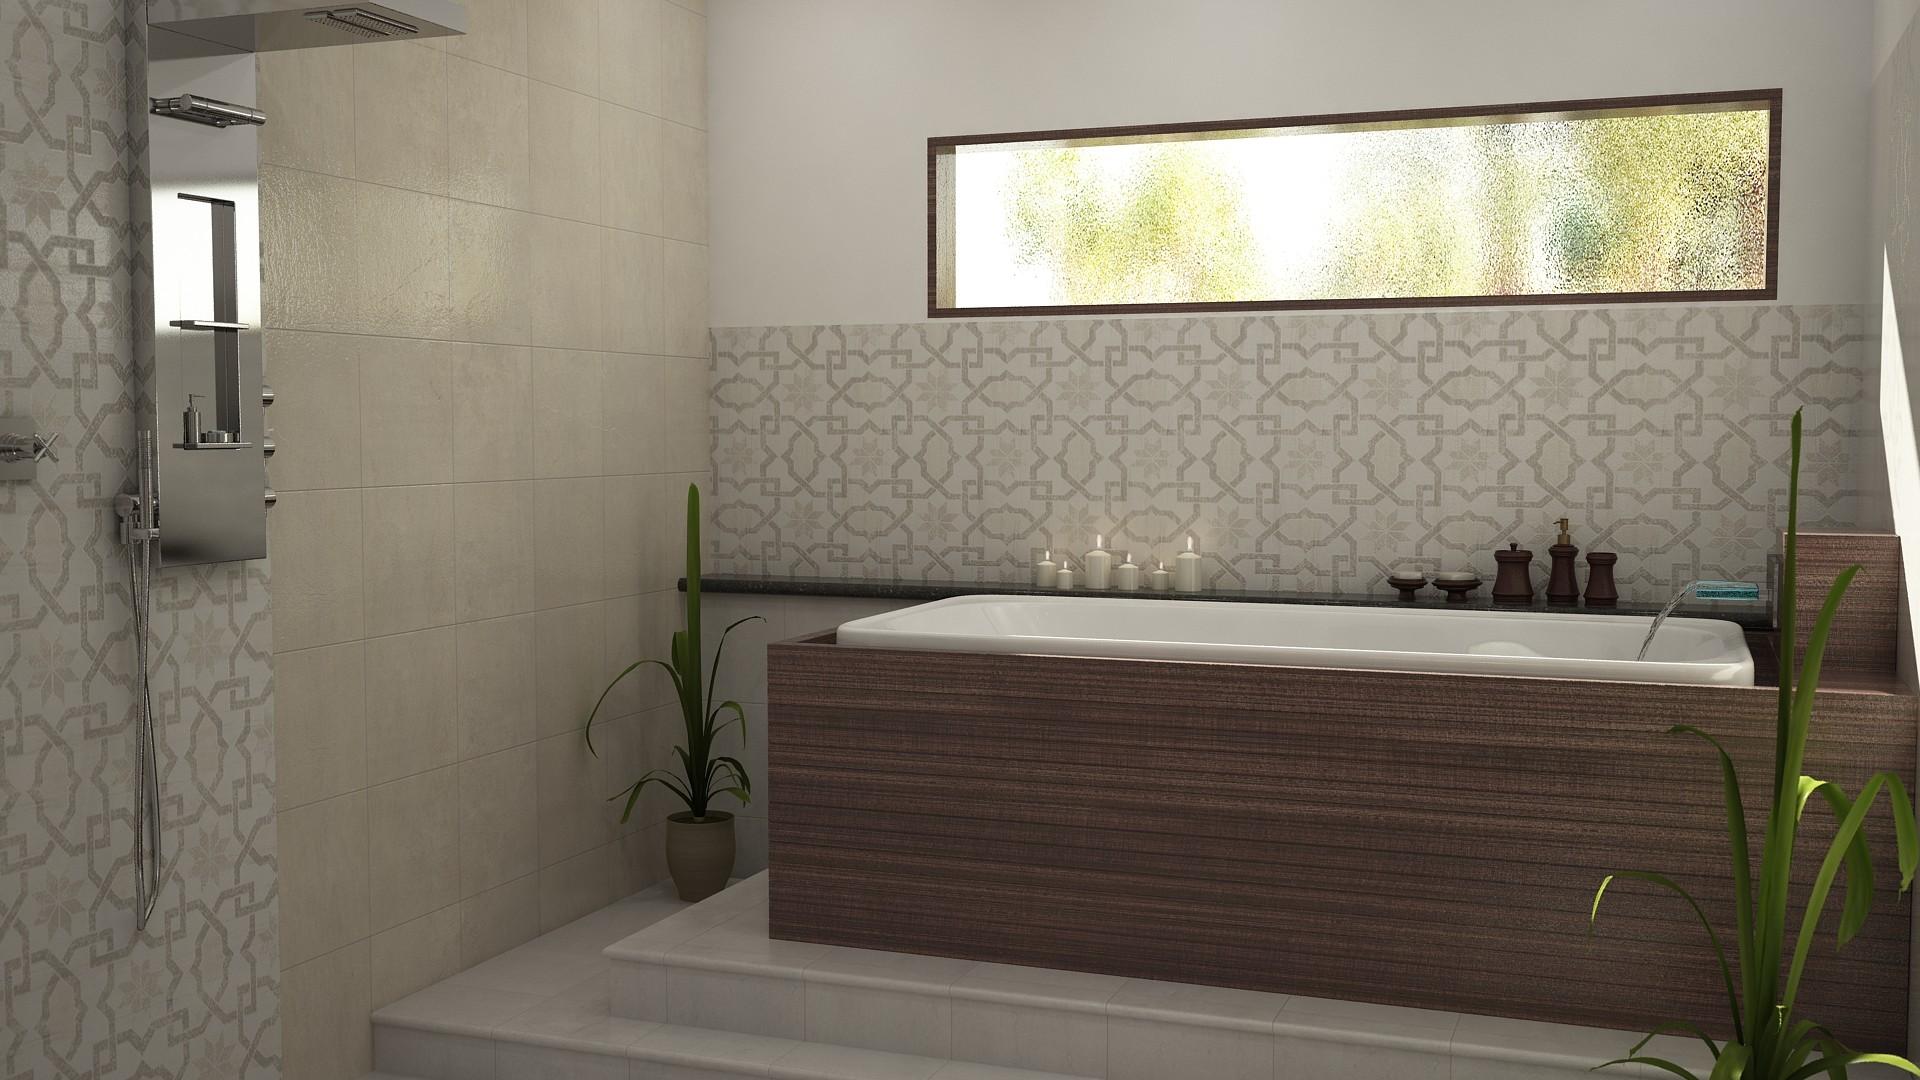 Swapnil parmar bathroom 1 view01